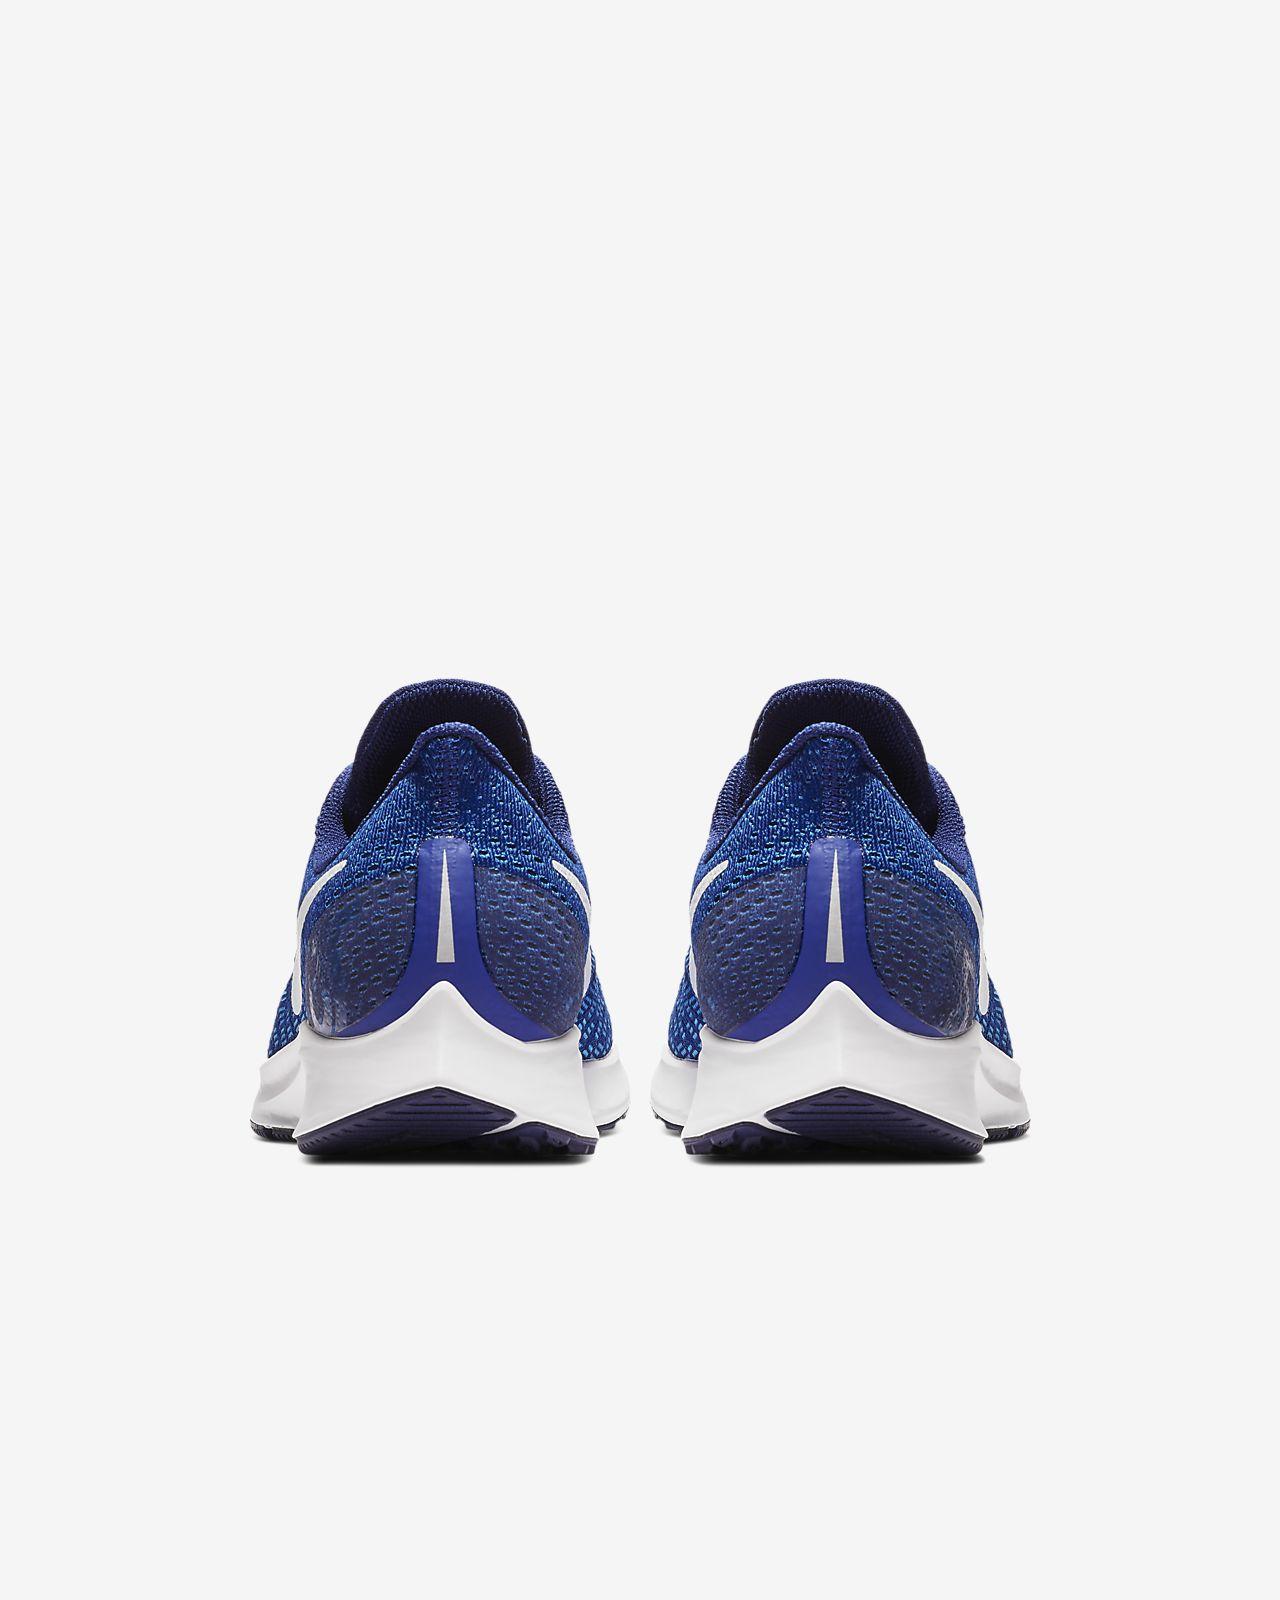 reputable site 045e4 80ff8 ... Nike Air Zoom Pegasus 35 Men s Running Shoe